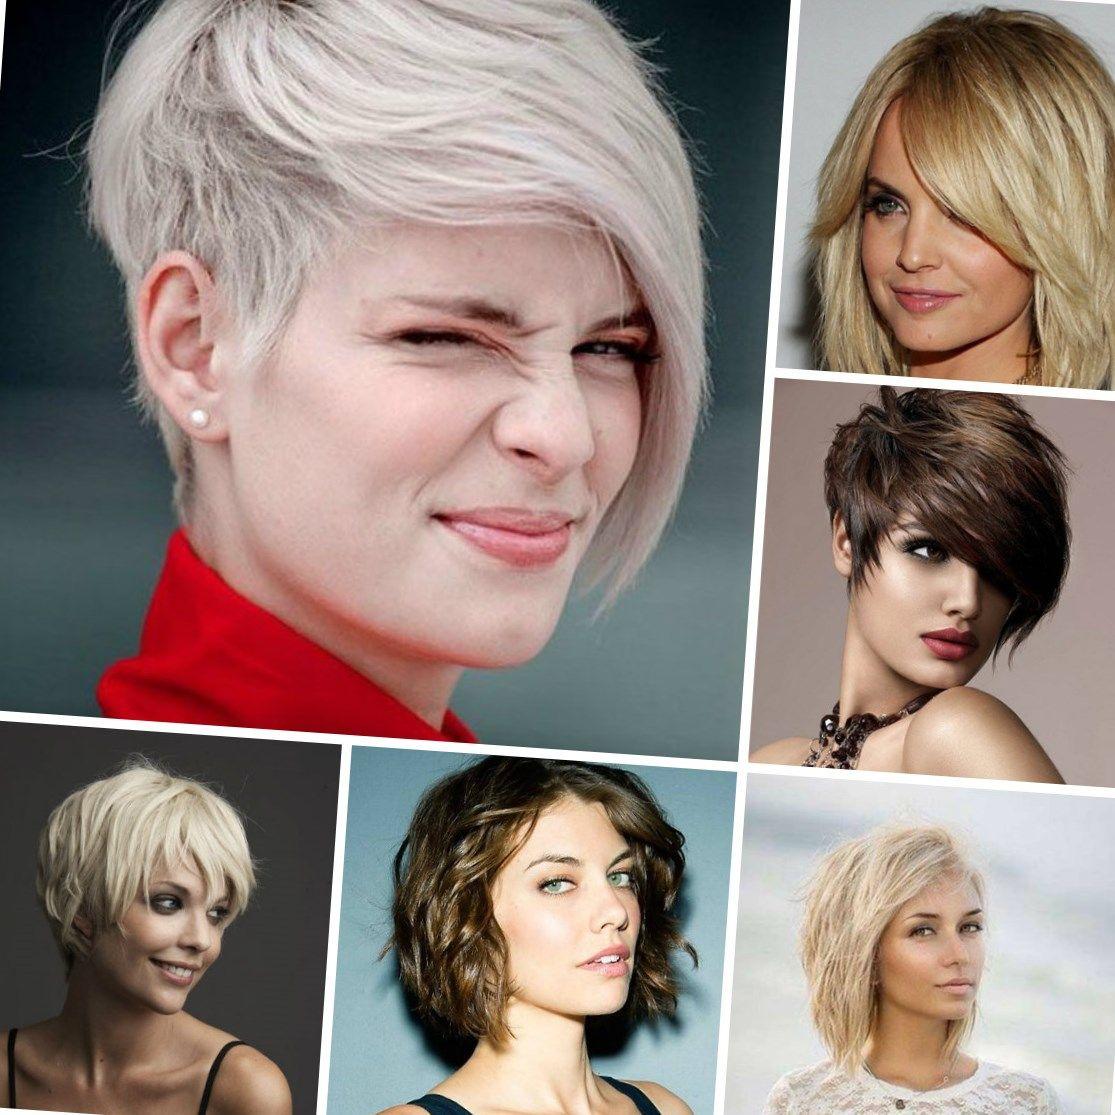 Hairstyle for short hair 2016 - http://frisuren2016.ru/frisurenkollektionen/7264-hairstyle-for-short-hair-2016.html #Frisurenkollektionen #trends #frisuren #haartrends #frisur #haarstyle